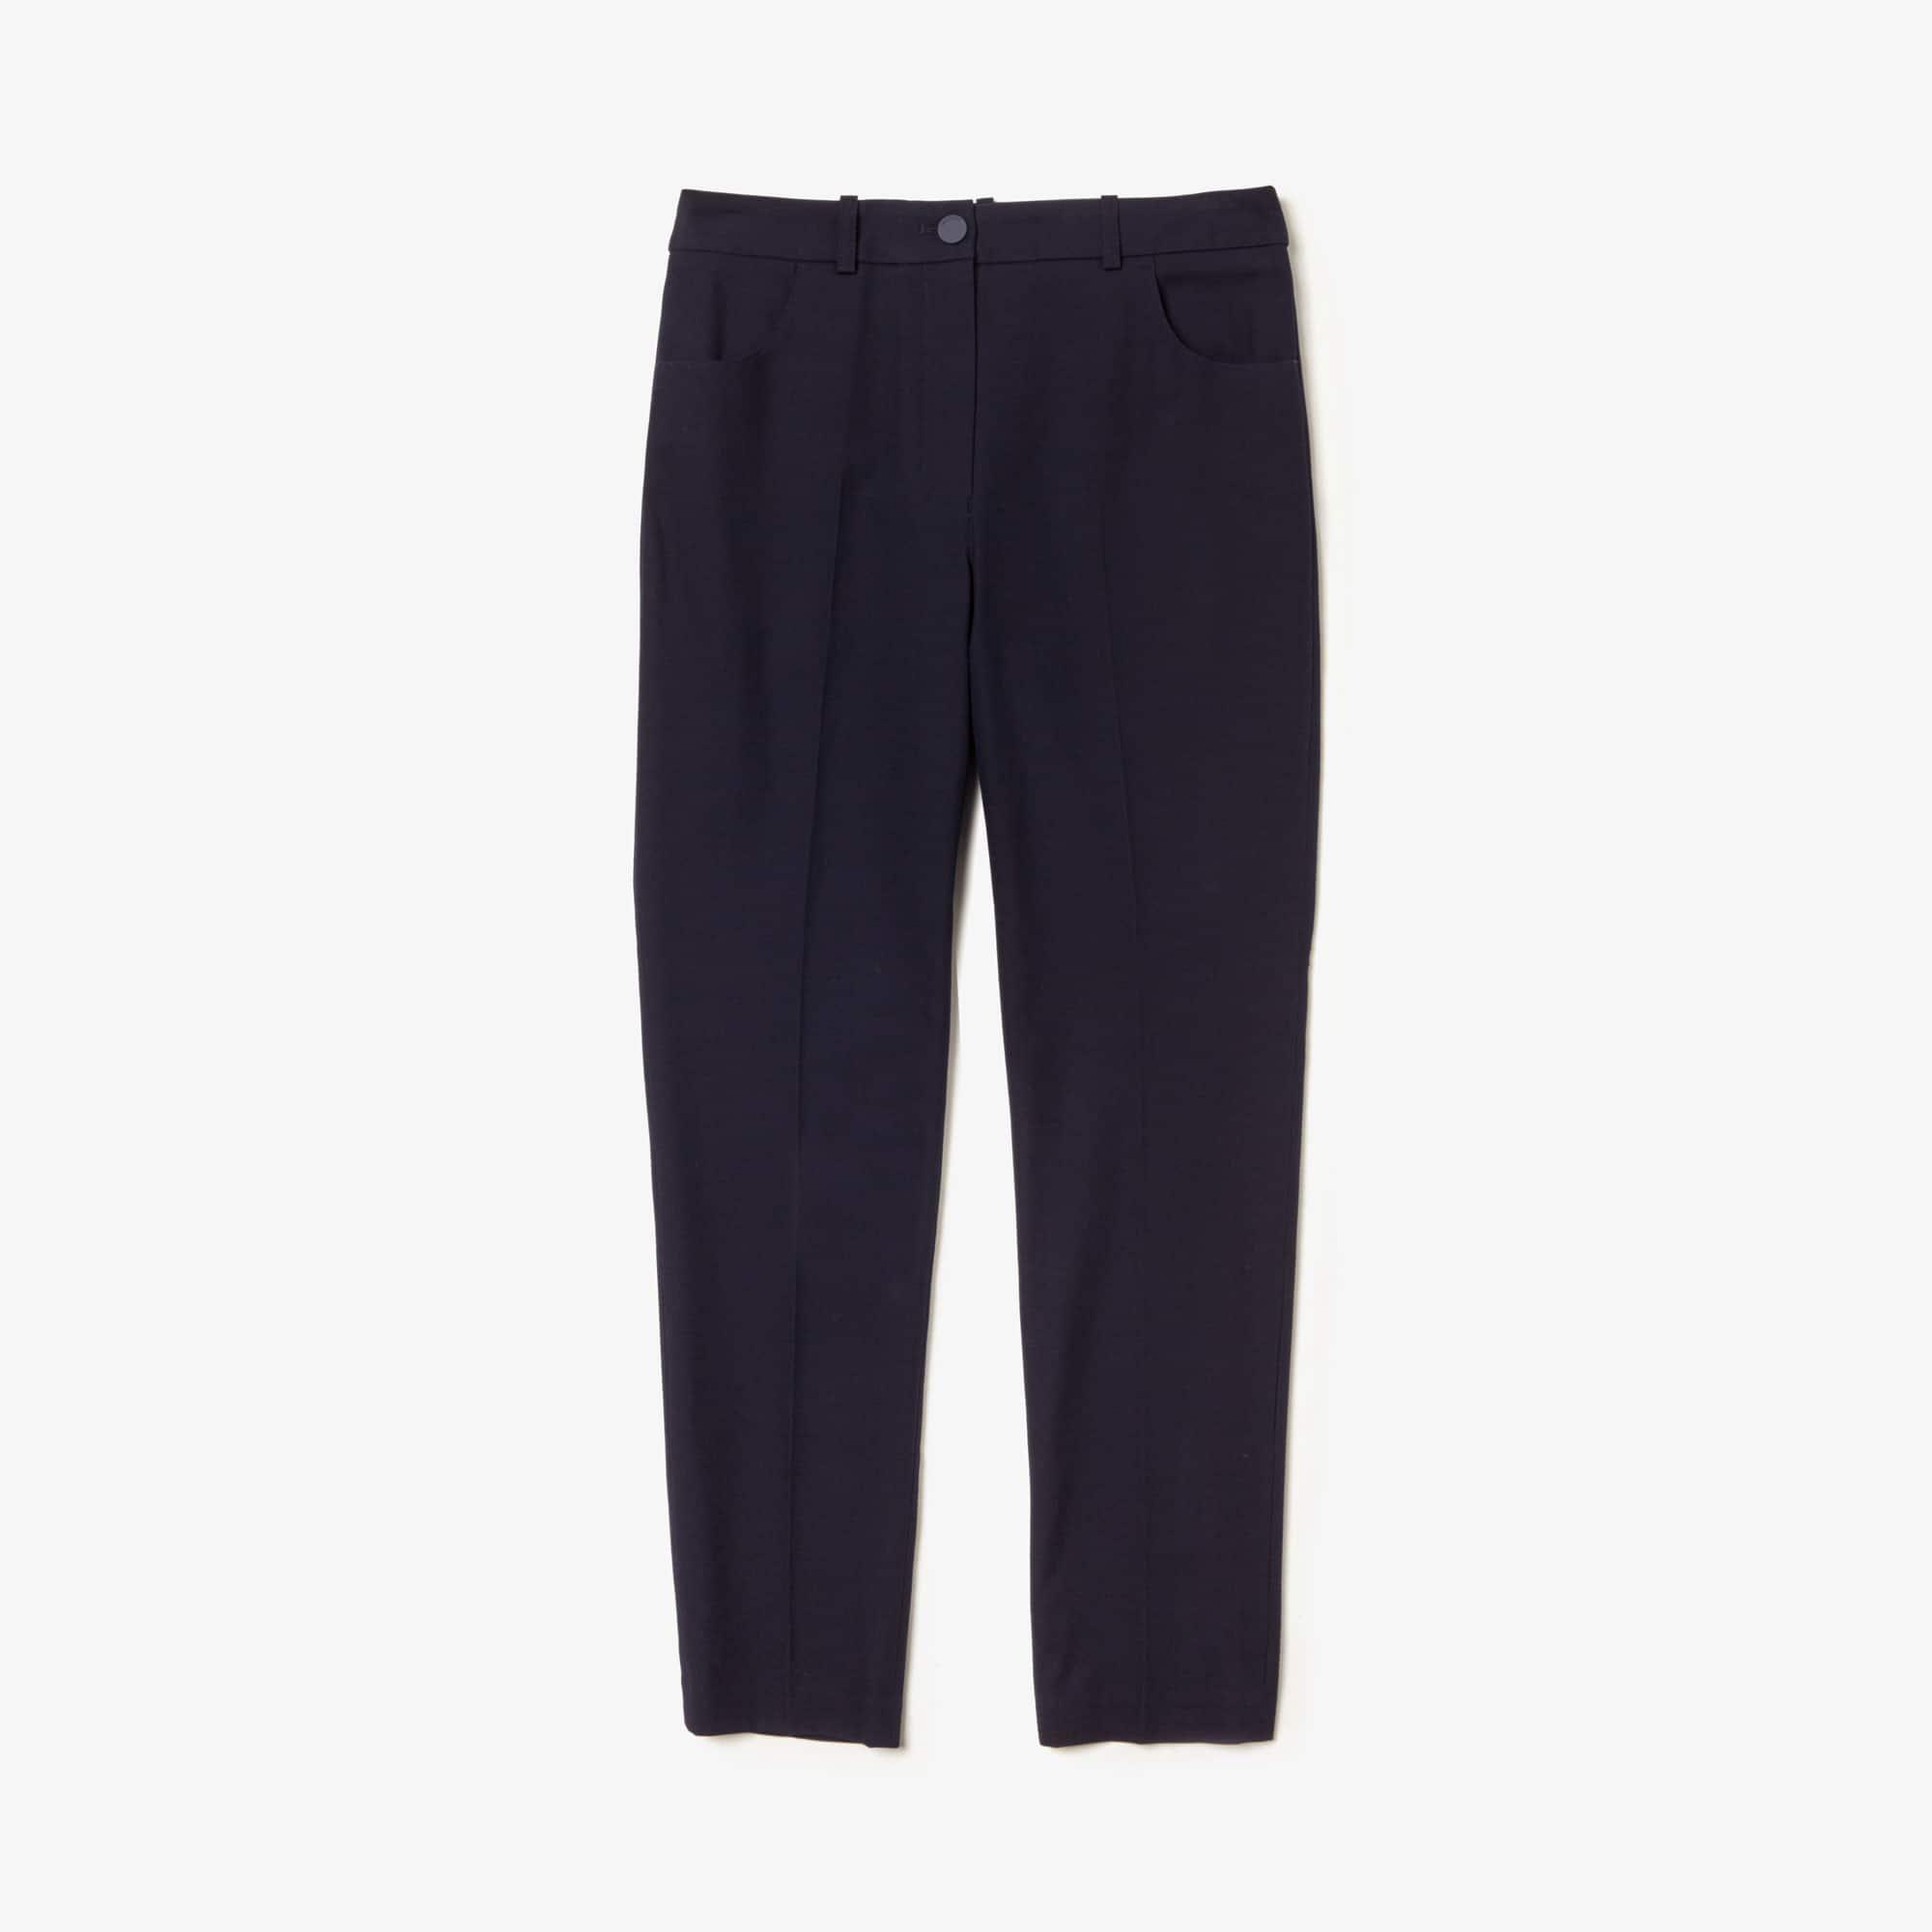 Lacoste Pants Women's Slim Fit Stretch Cotton Twill Pants